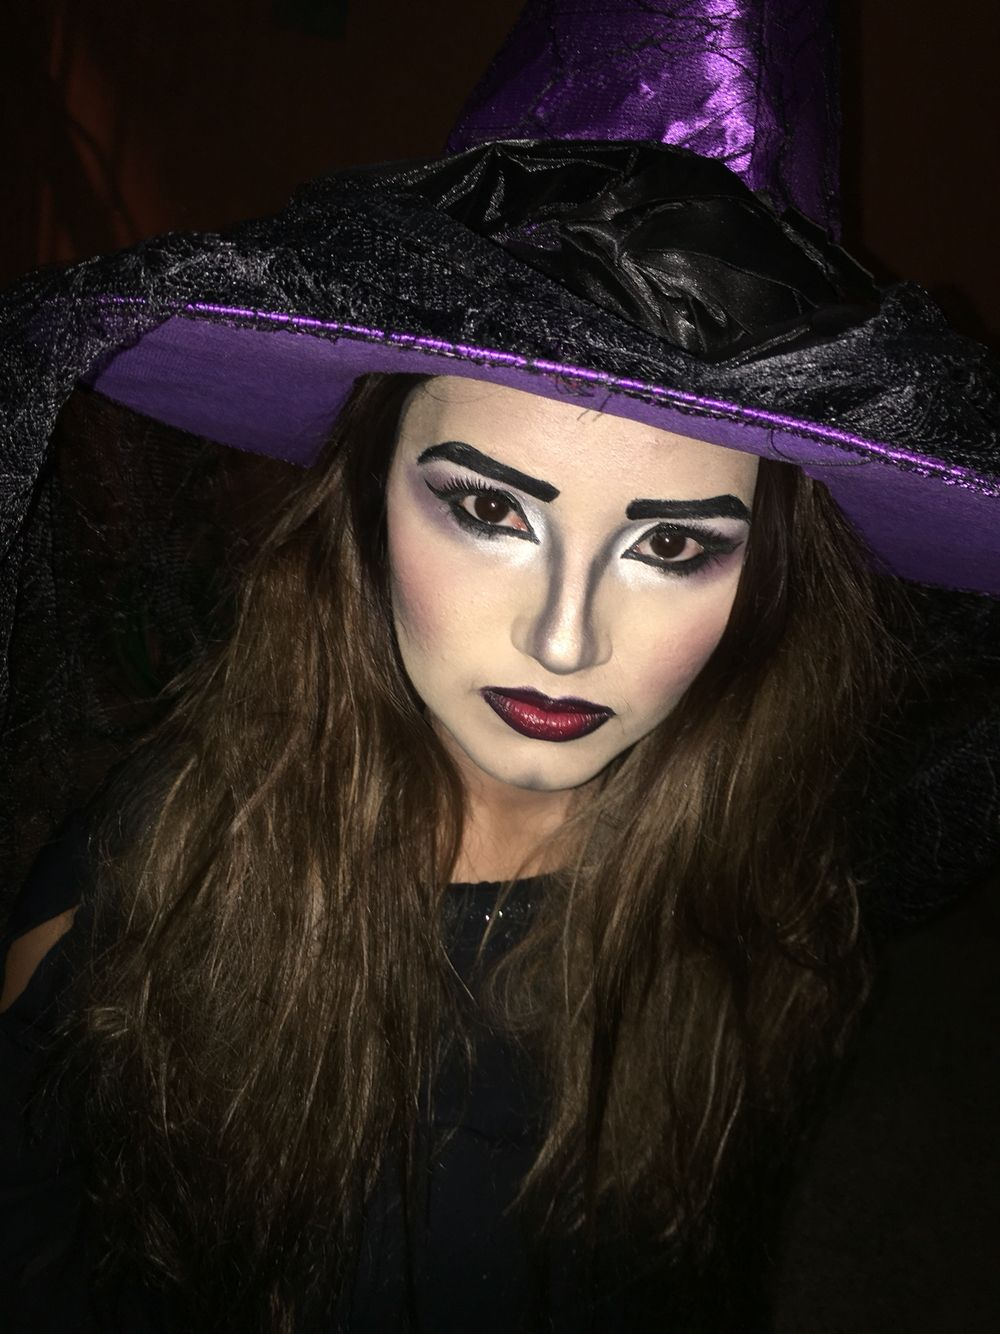 Disfraz halloween 2015 maquillaje bruja disfraces maquillaje bruja halloween maquillaje - Como pintar a una nina de bruja para halloween ...